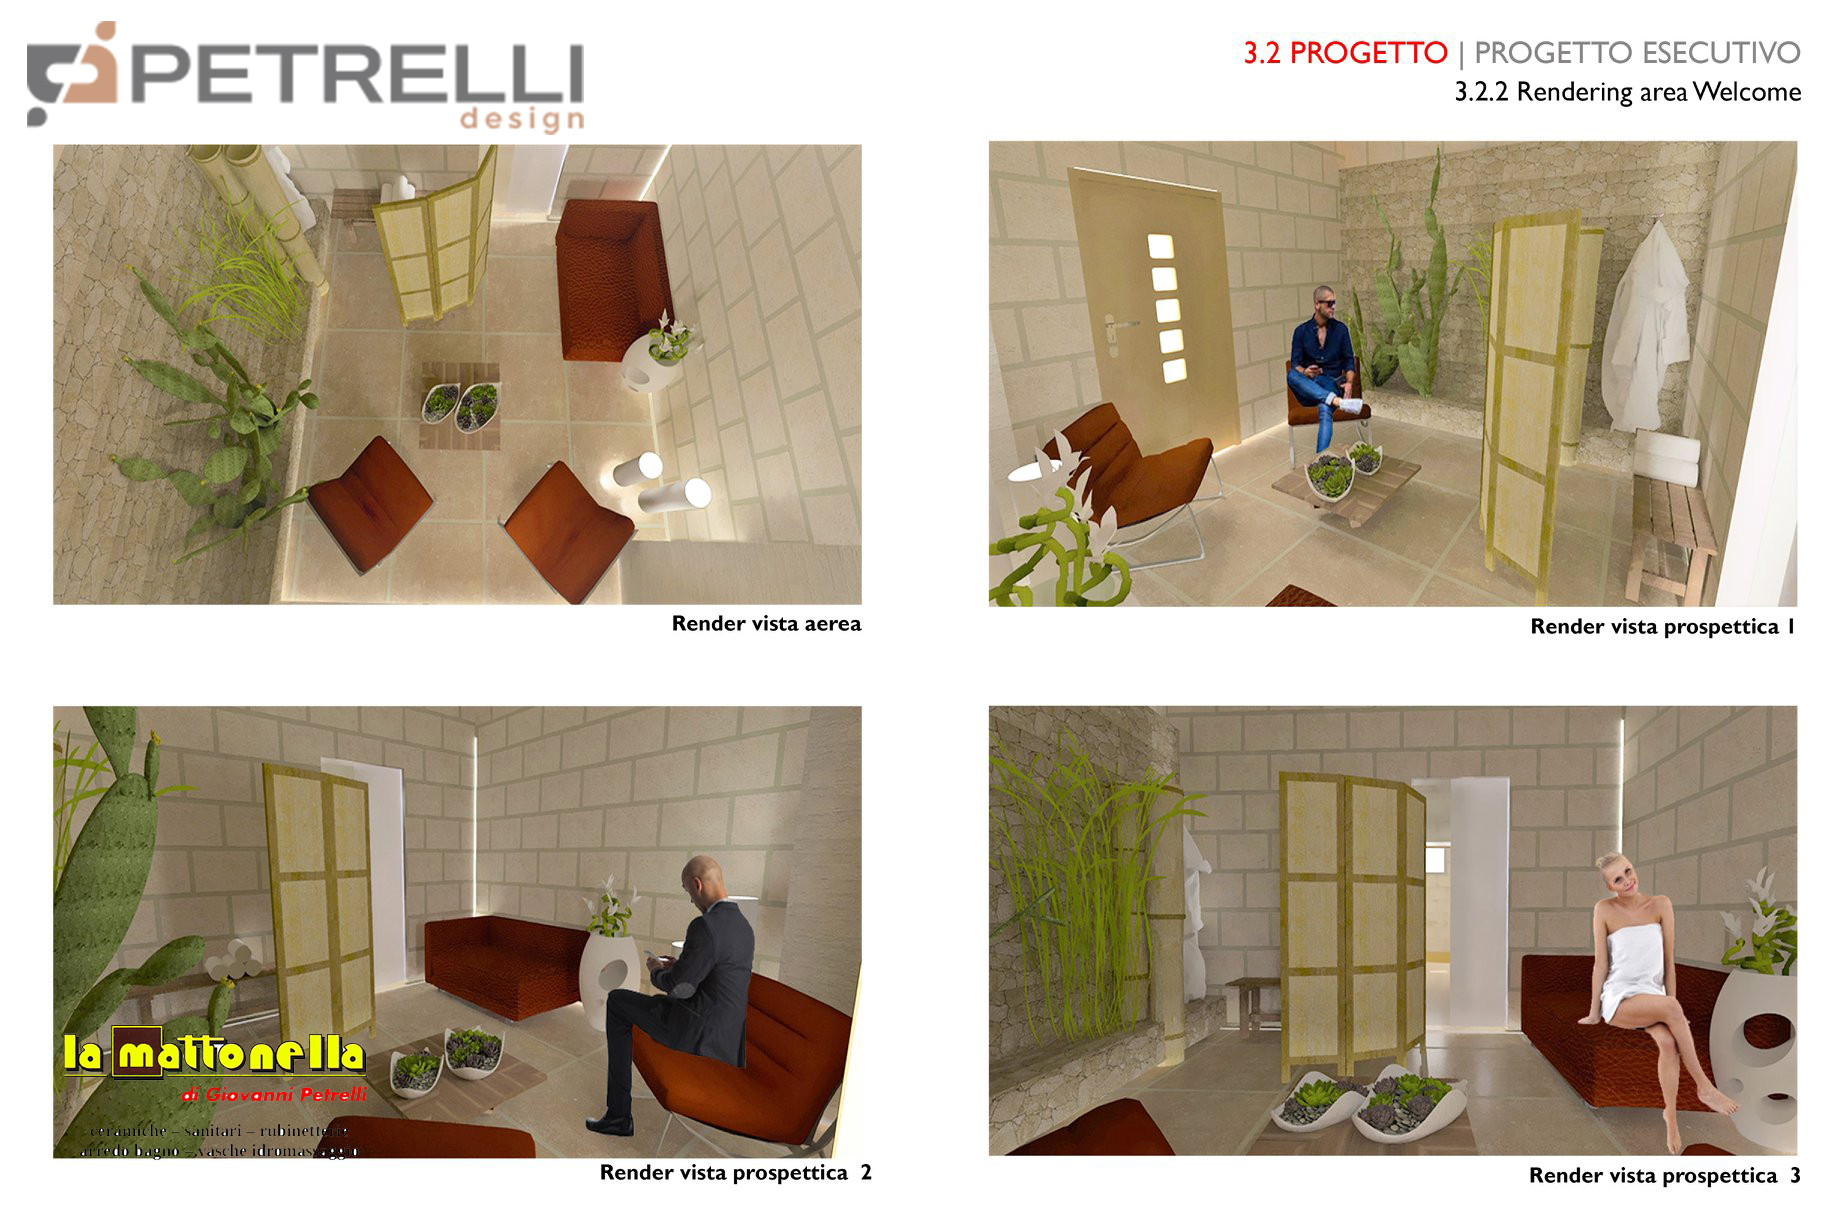 RistRutturatION - Interior1 - 2 - PetrelliDesign